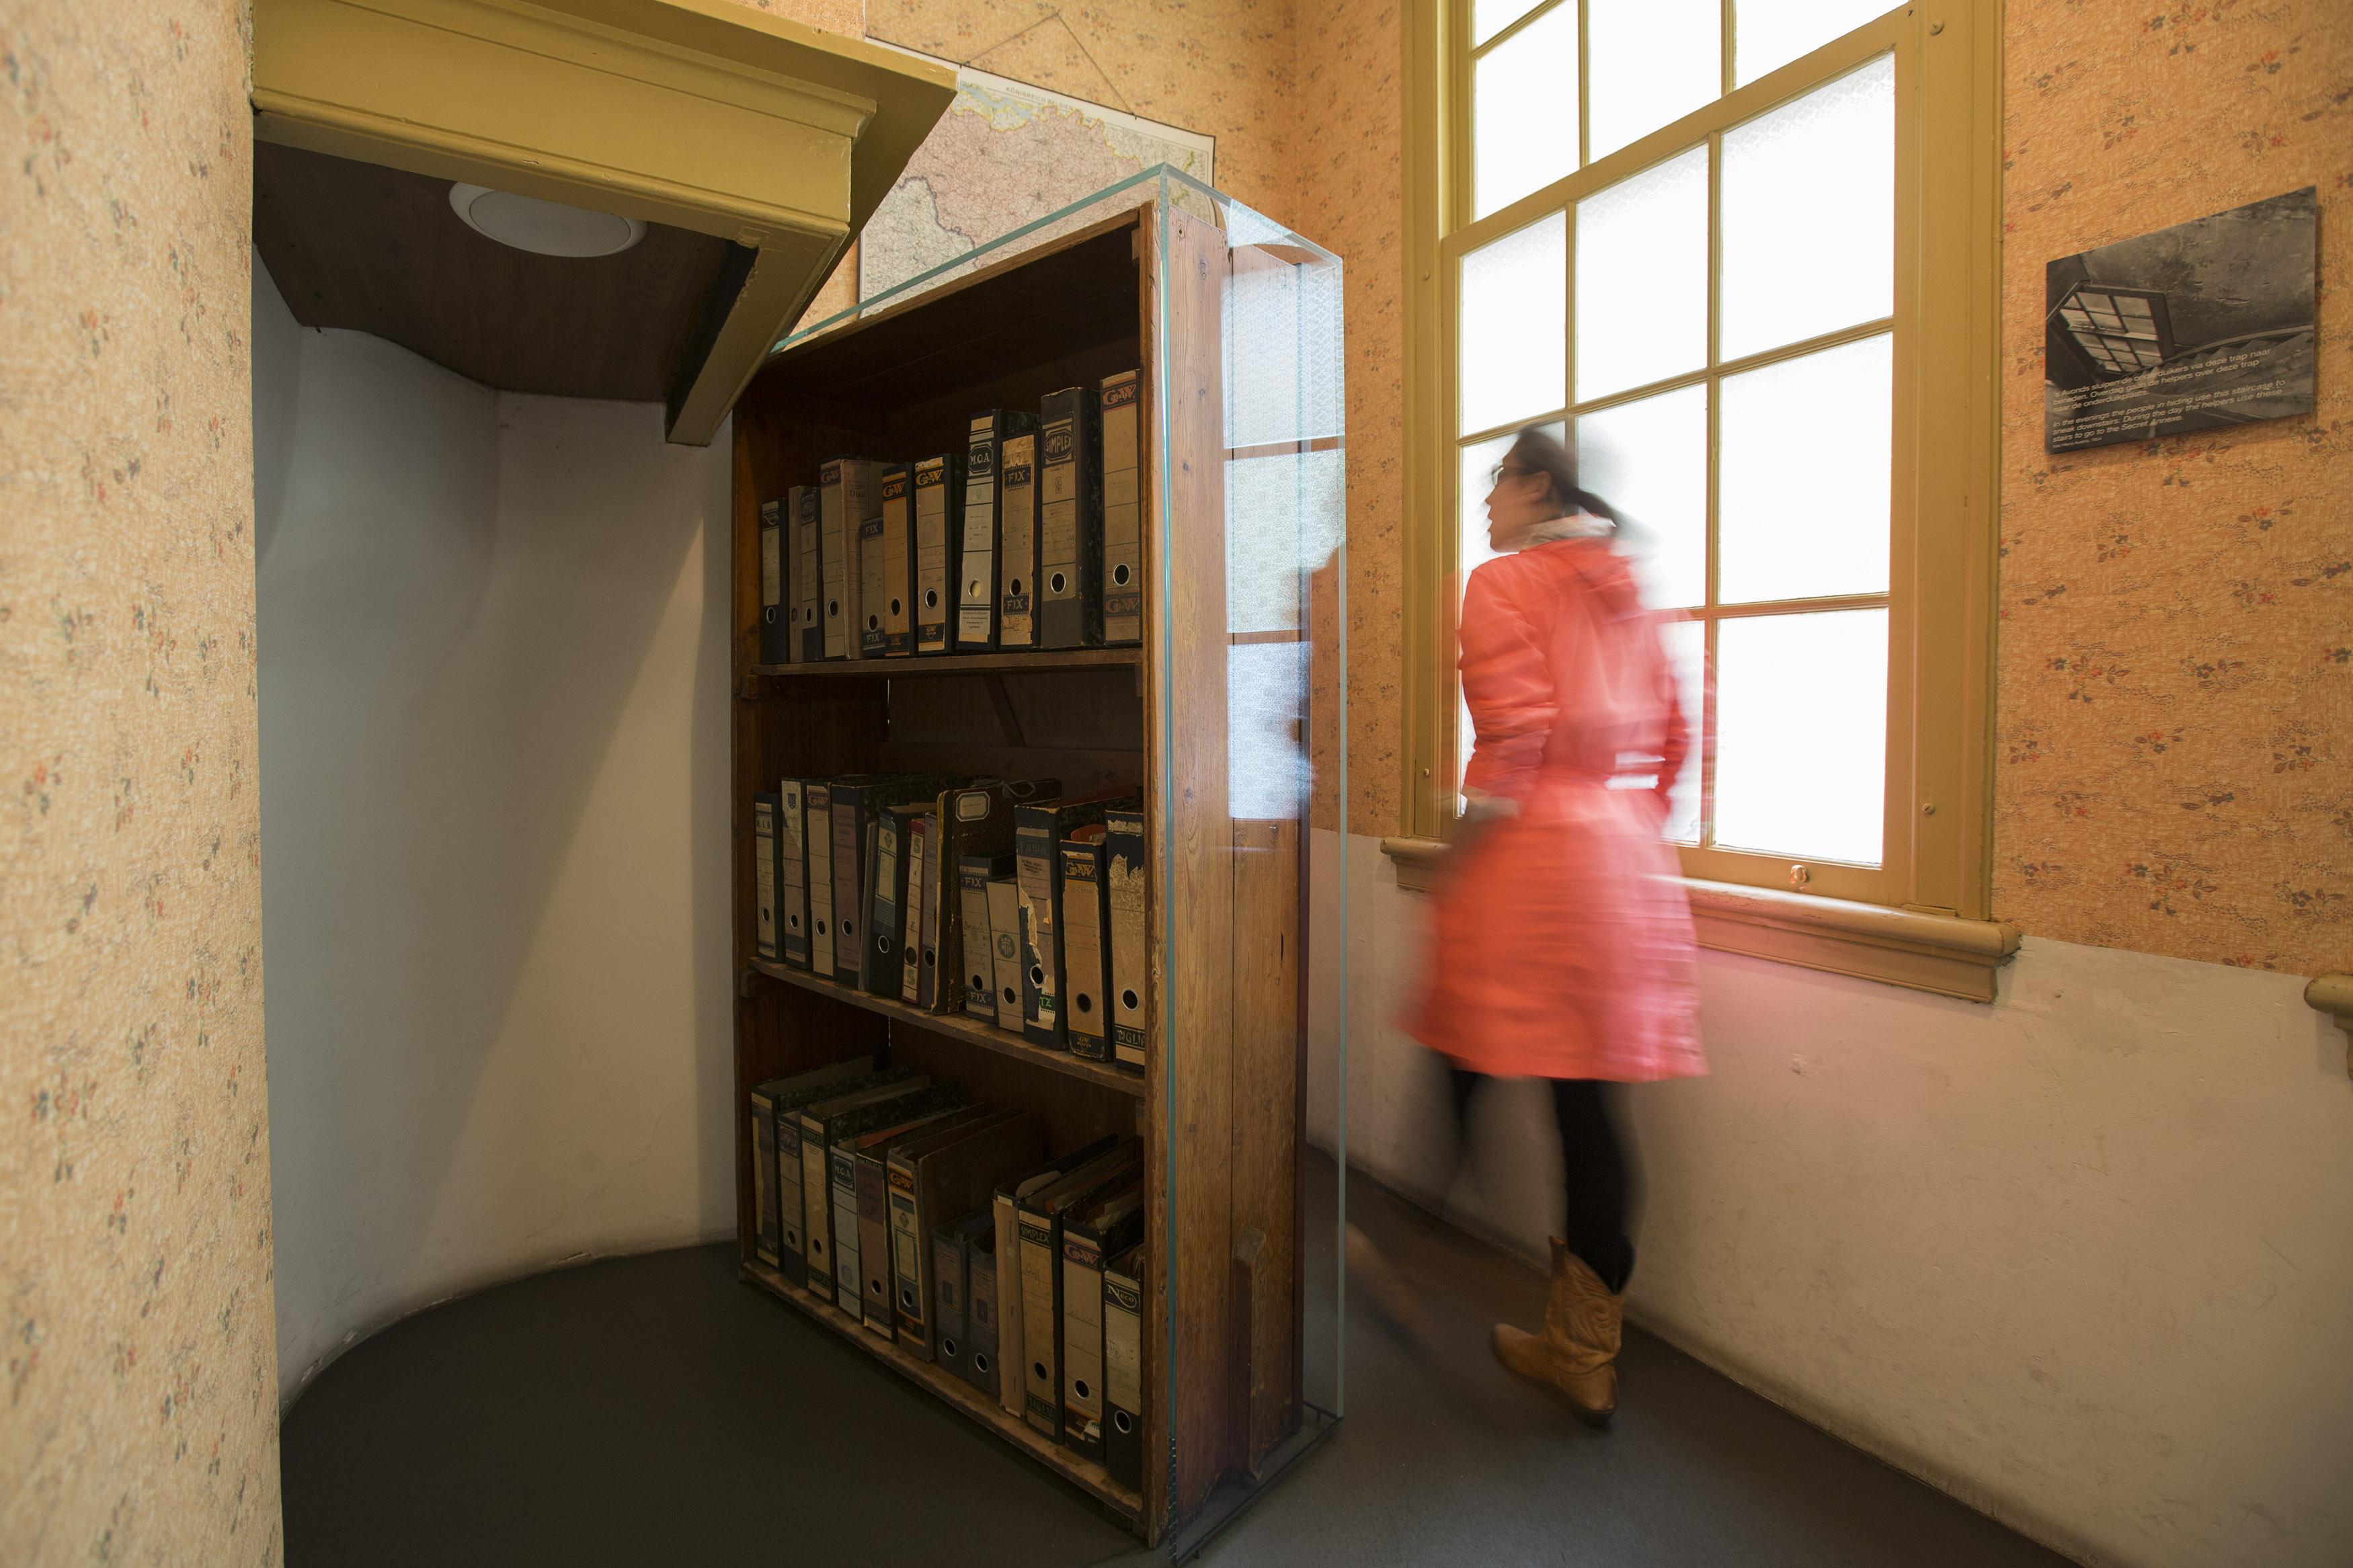 Web And Digital Anne Frank House